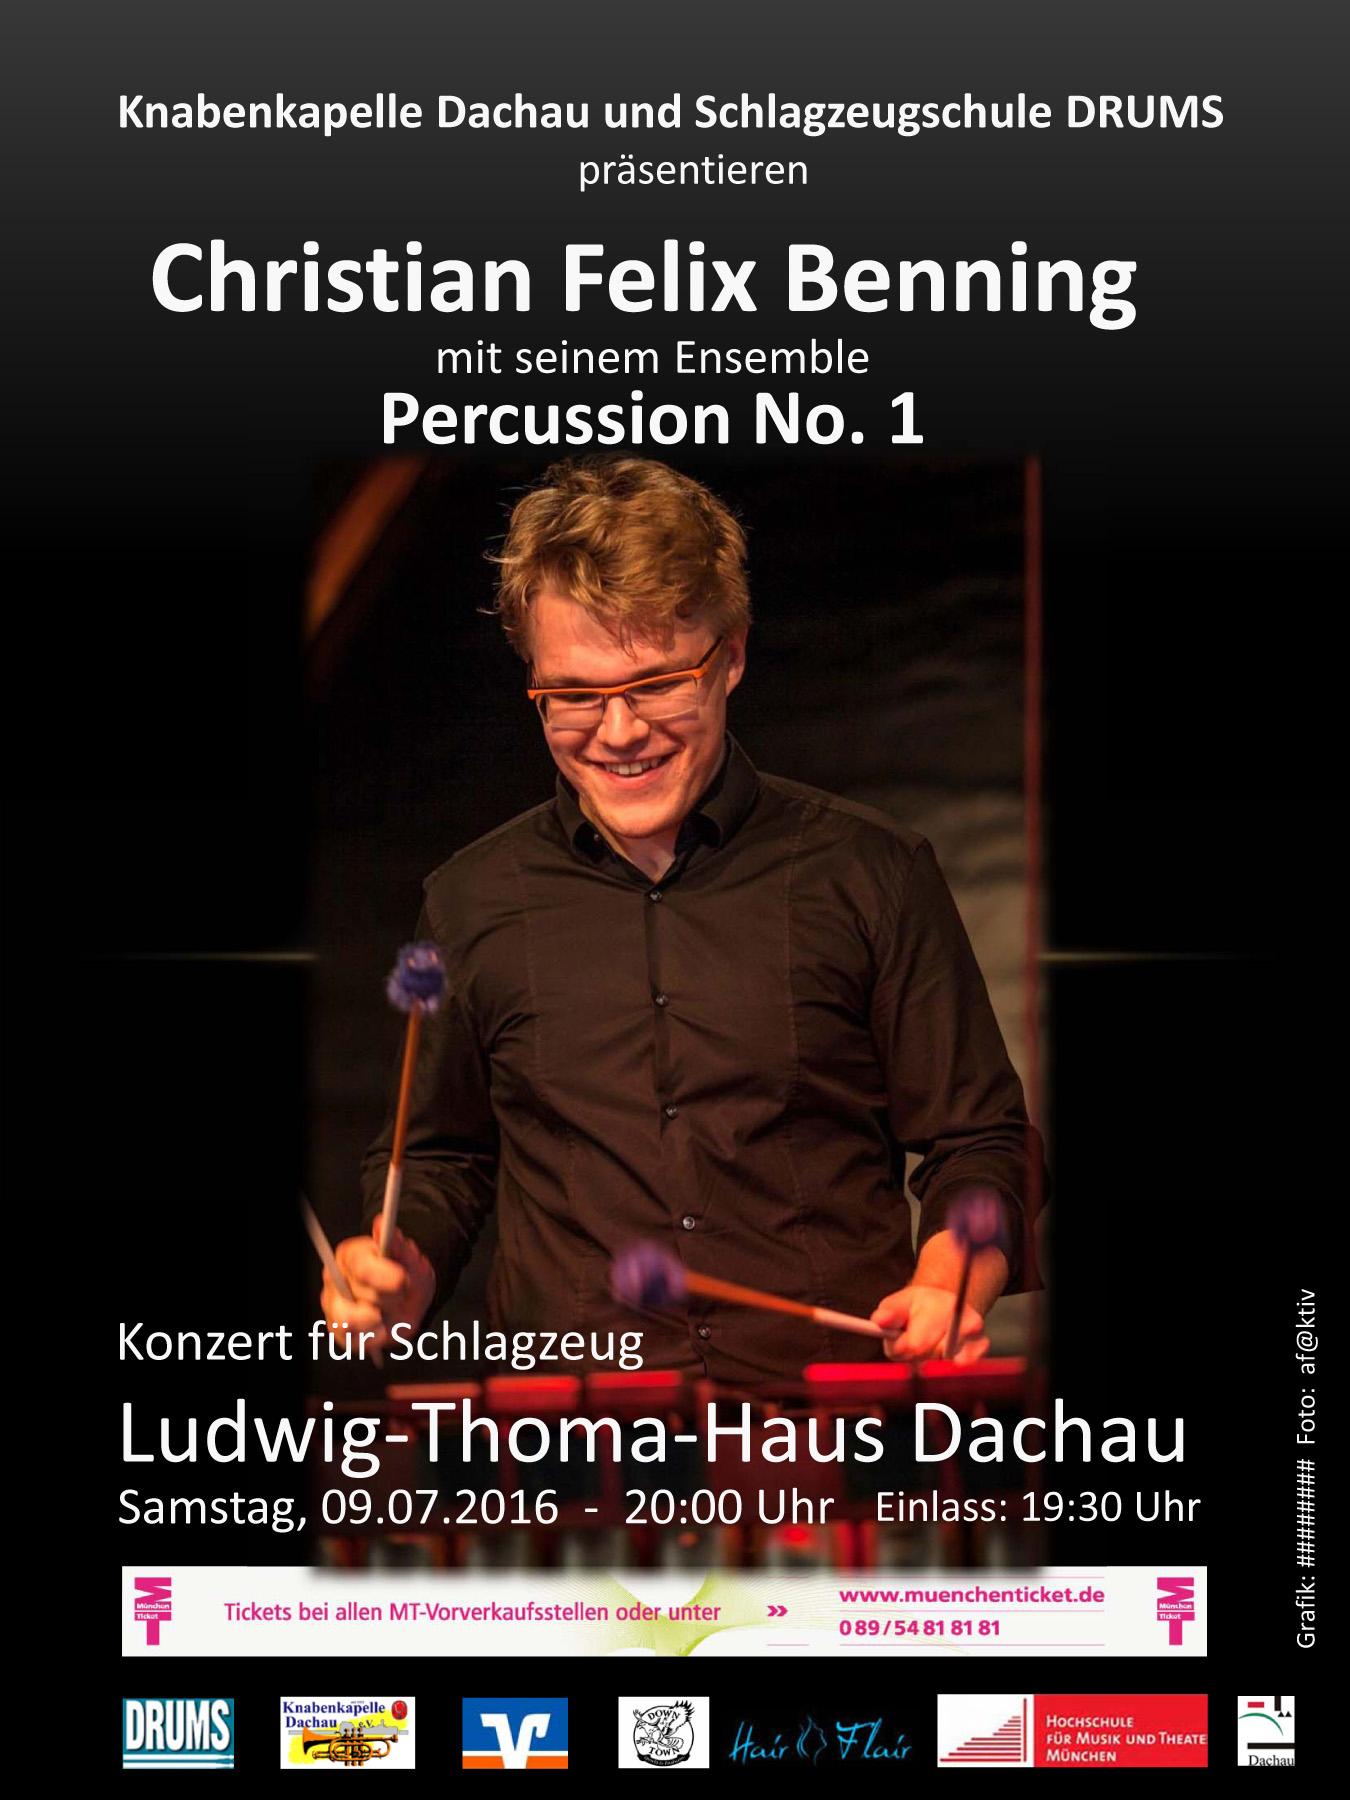 Christian Felix Benning & Percussion No. 1